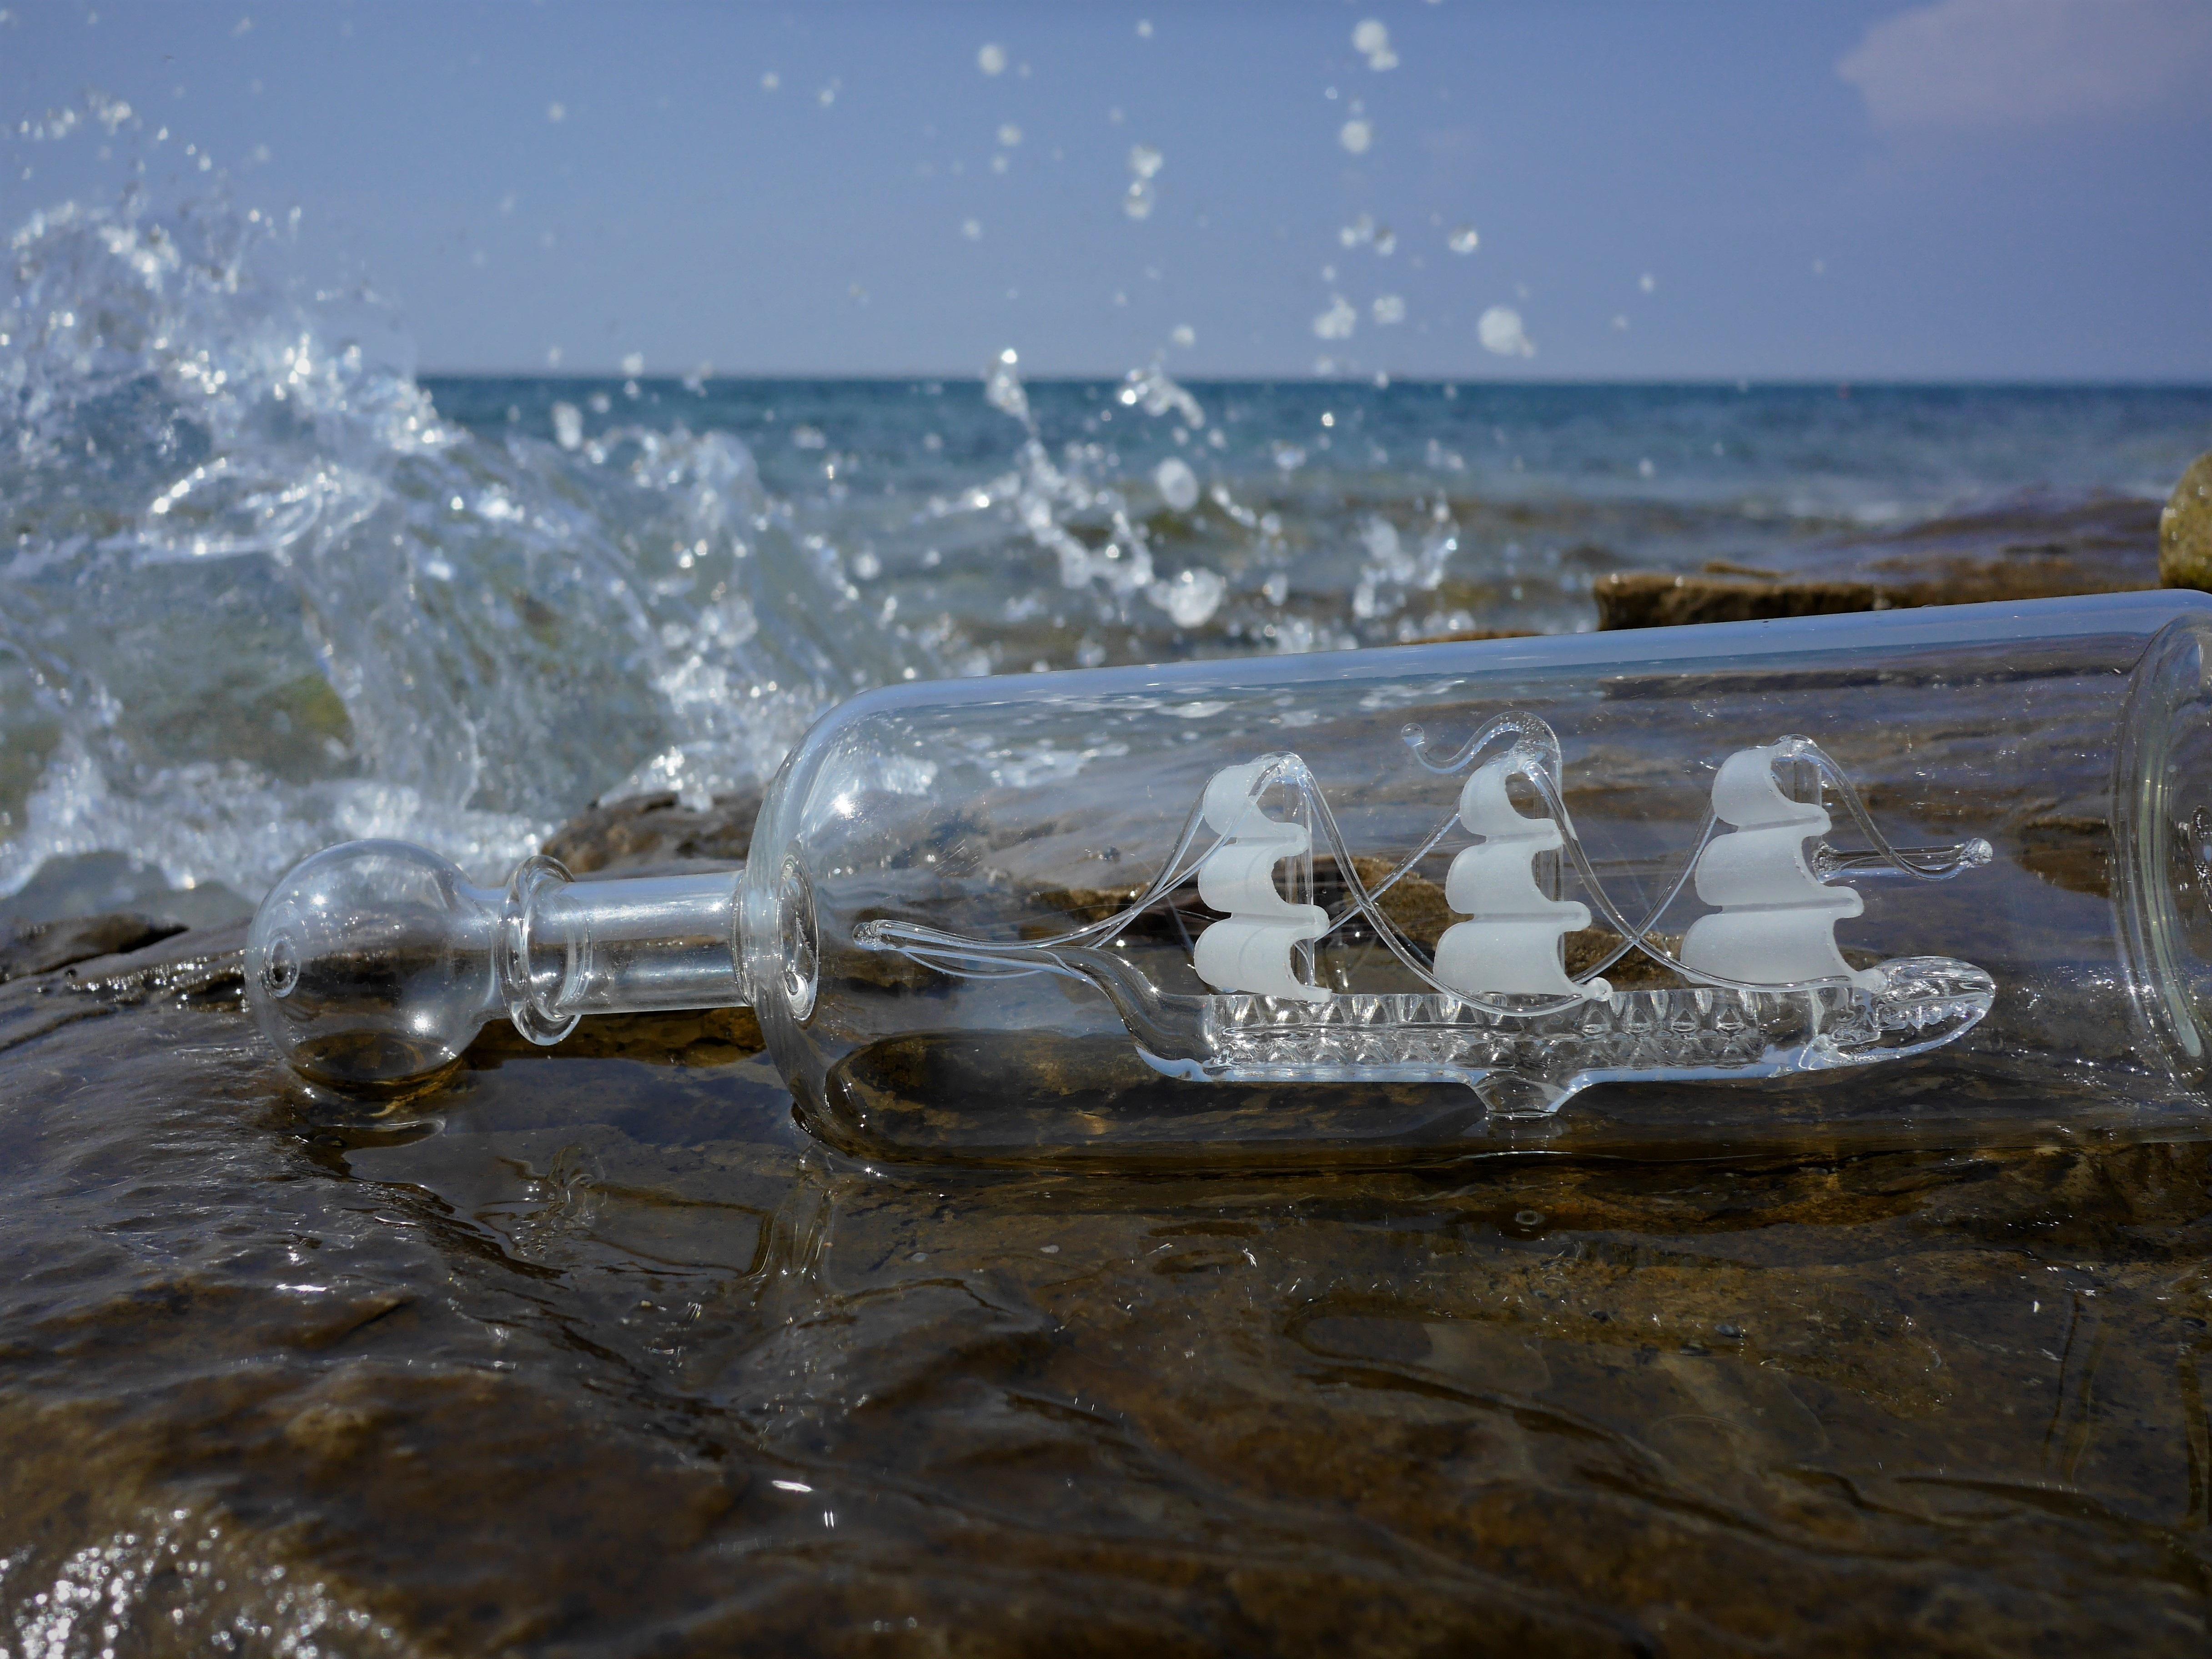 mer eau voyage